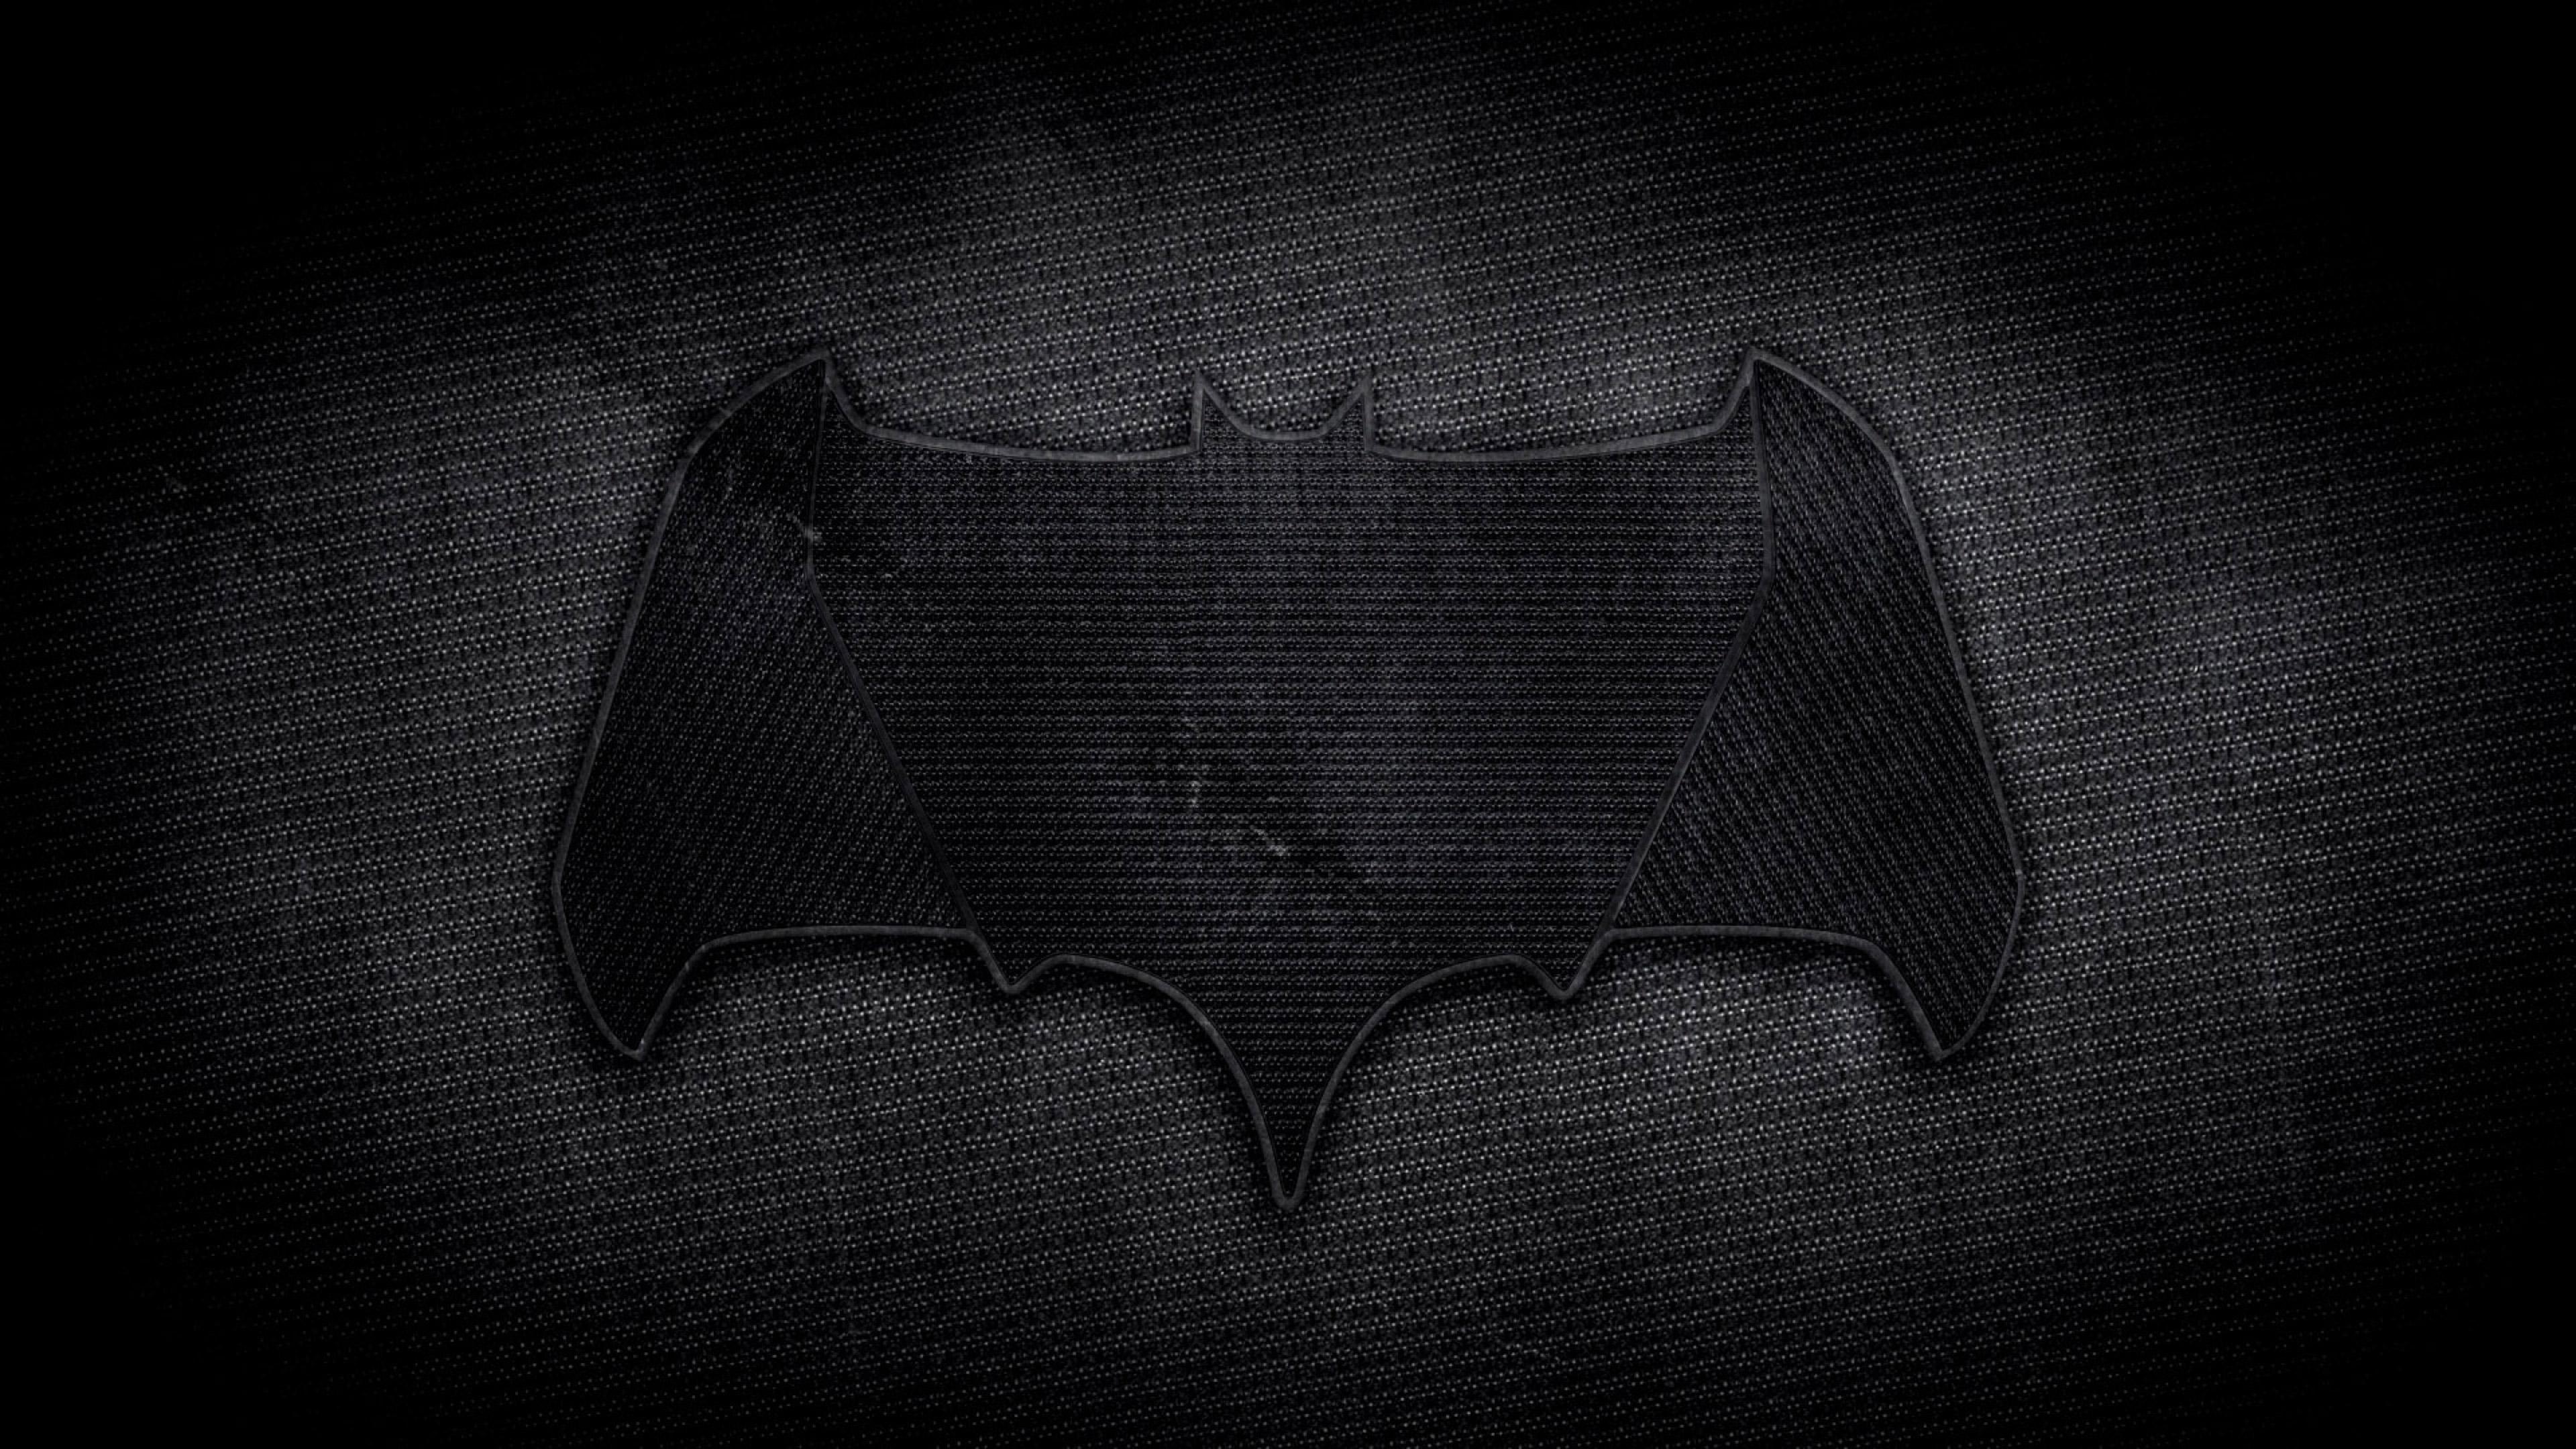 Batman Dark Leather Logo 1400x900 Resolution